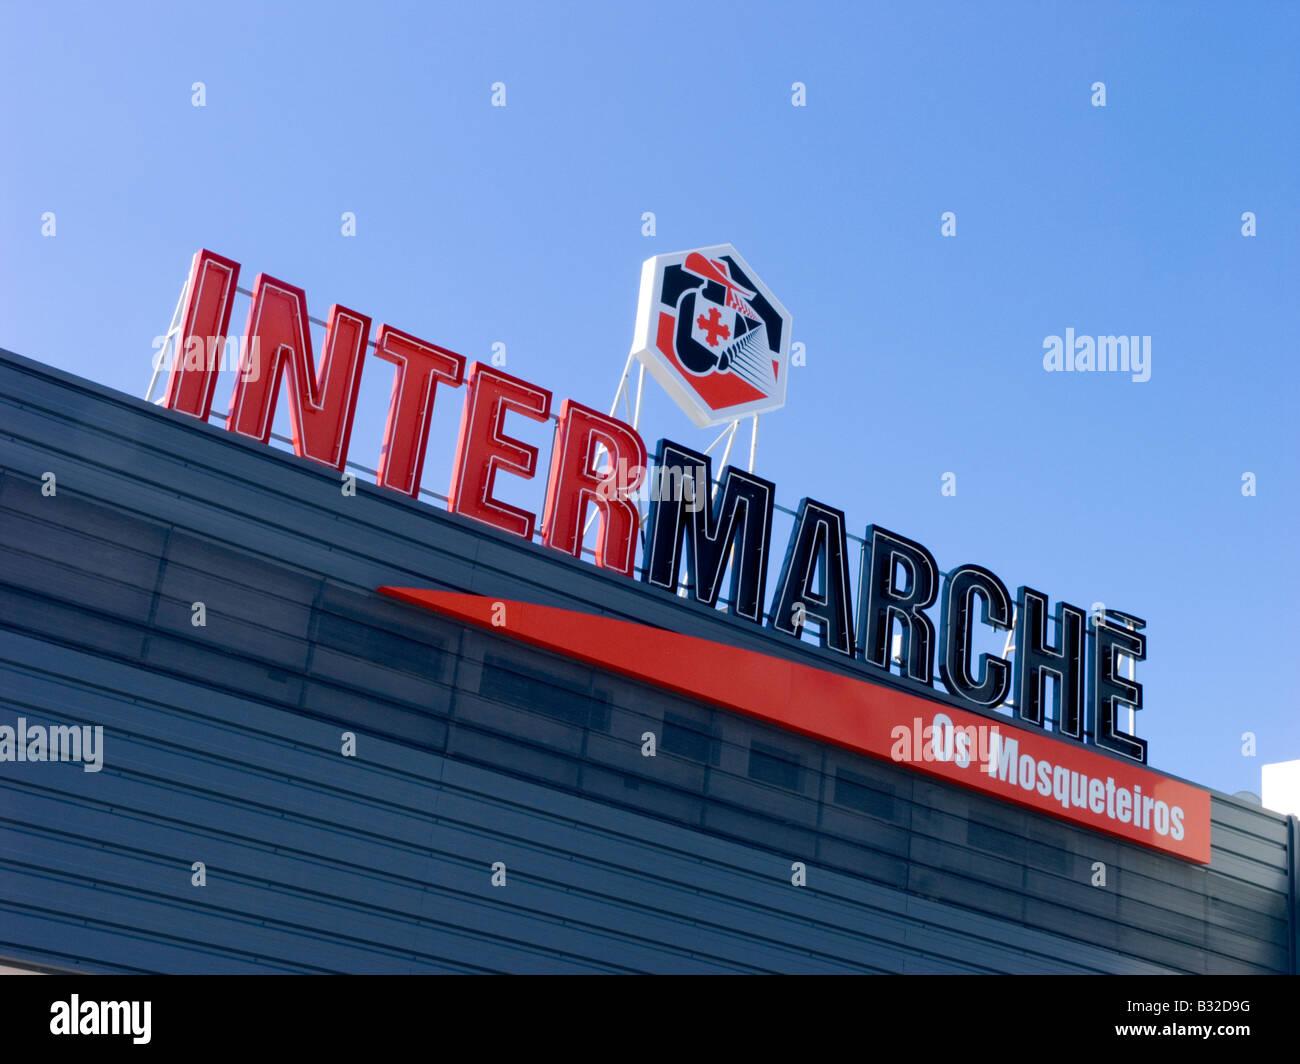 Intermarche sign Os Mosqueteiros Stock Photo